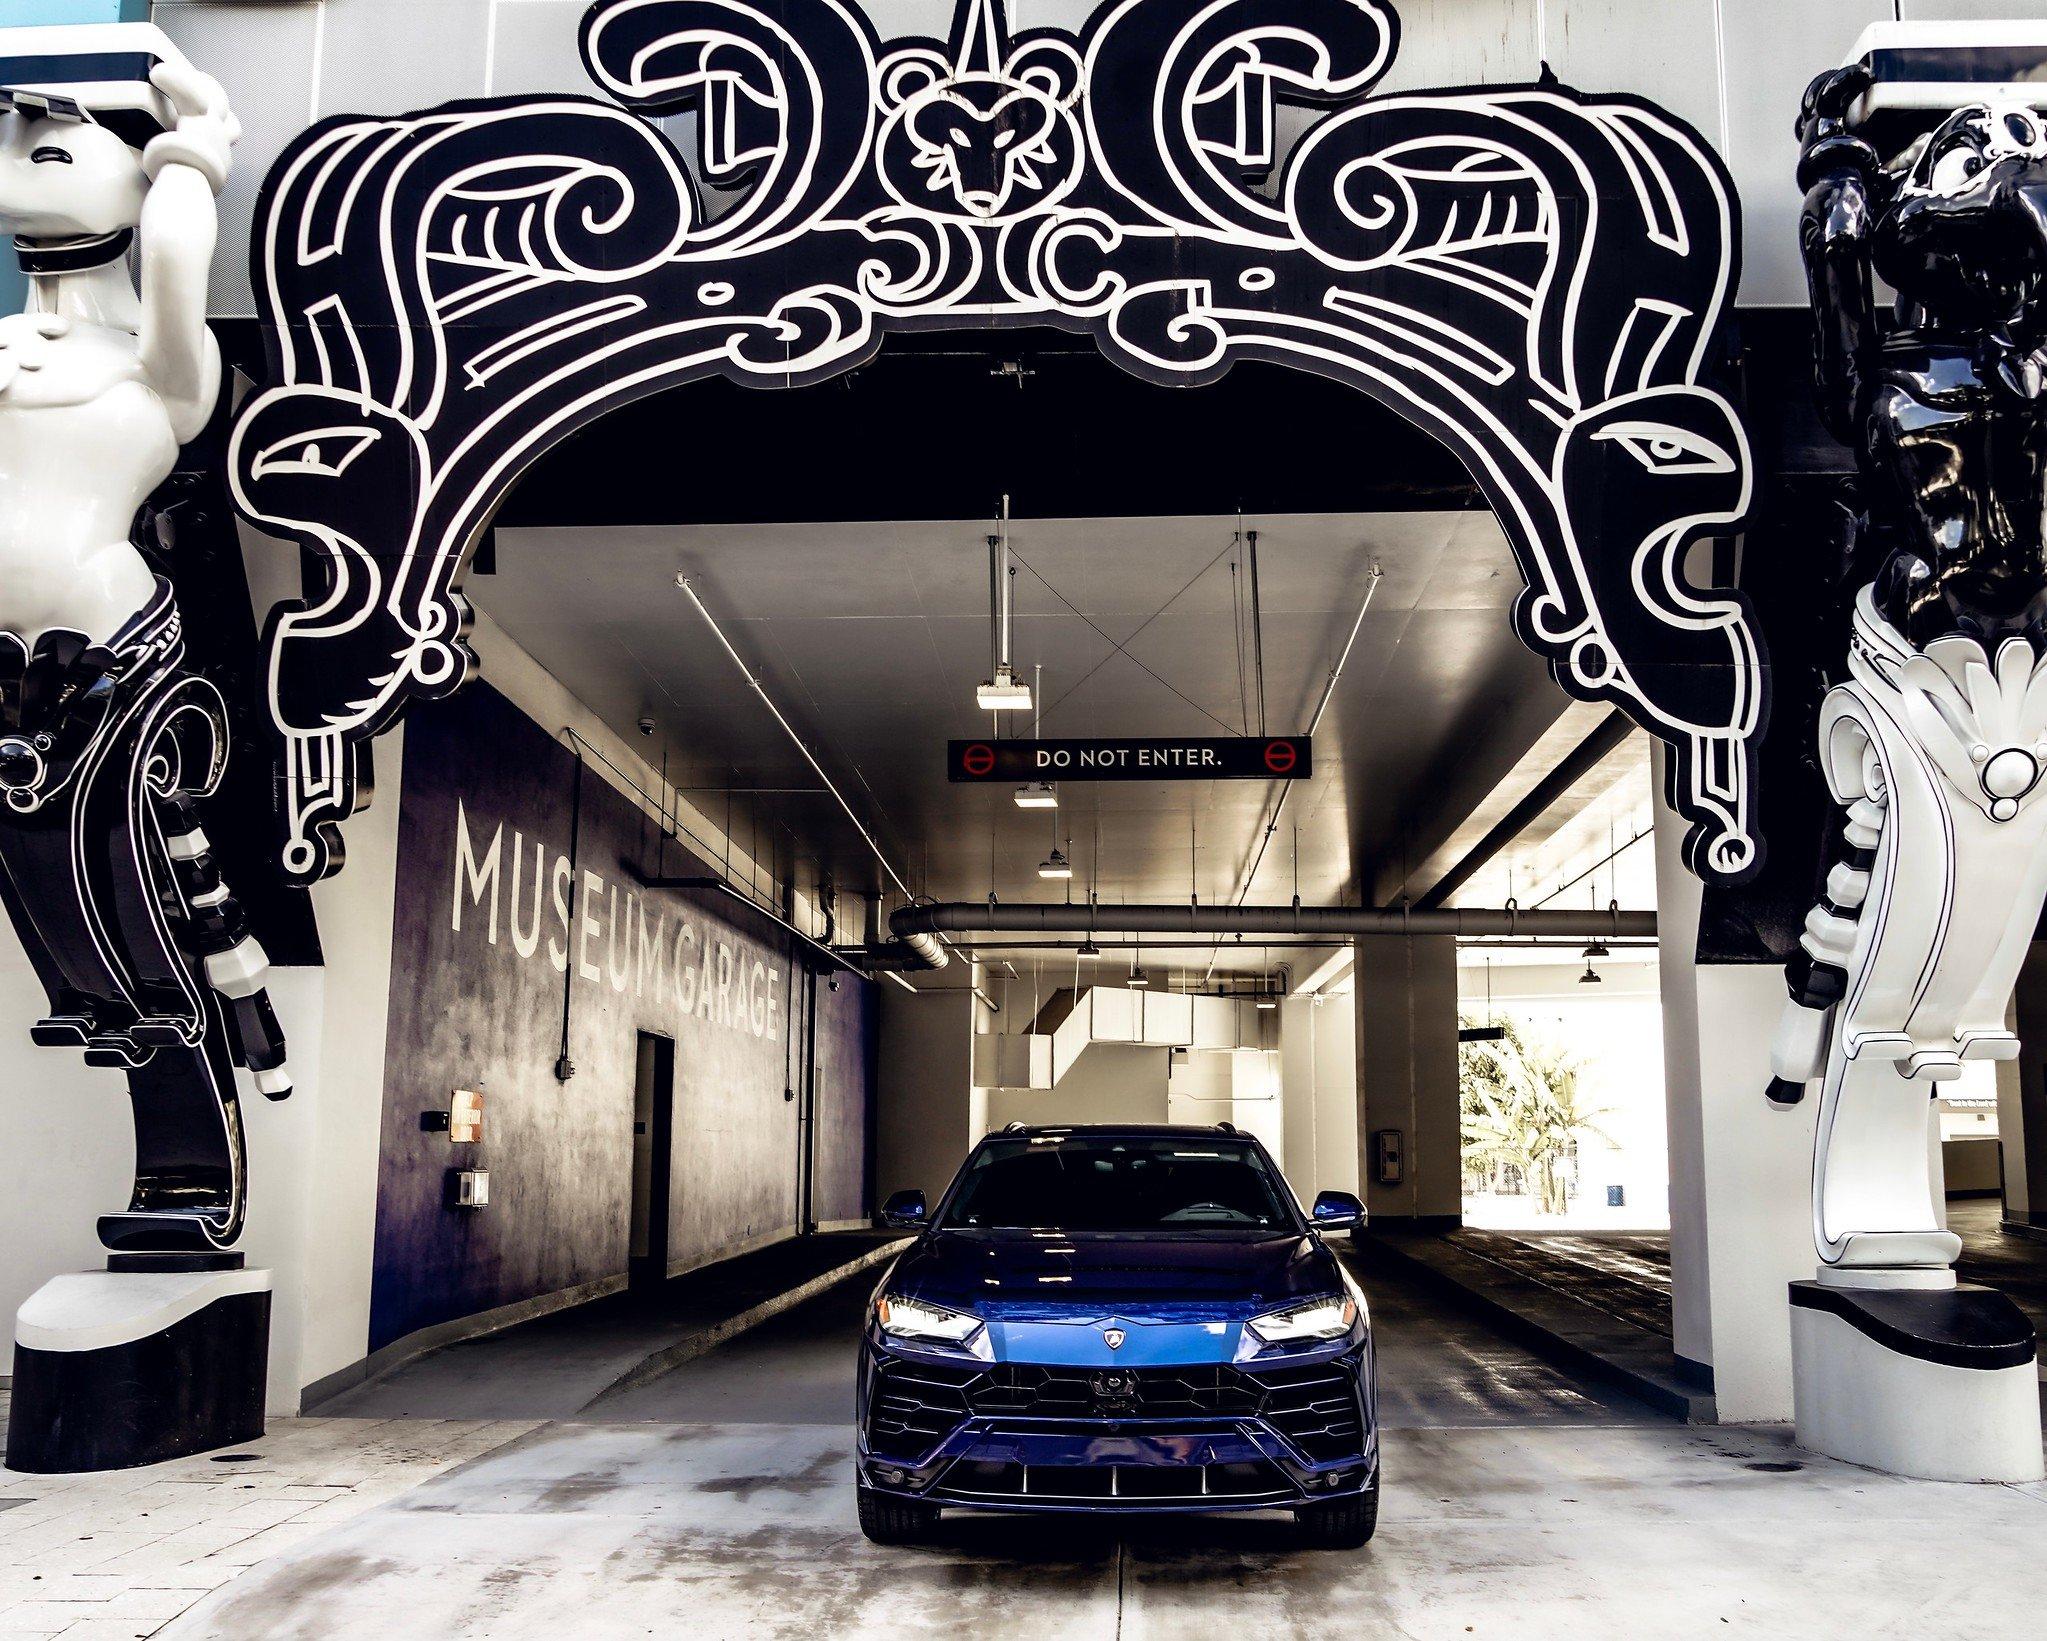 Image #15 of our  2021 Lamborghini Urus - Dark Blue    In Miami Fort Lauderdale Palm Beach South Florida